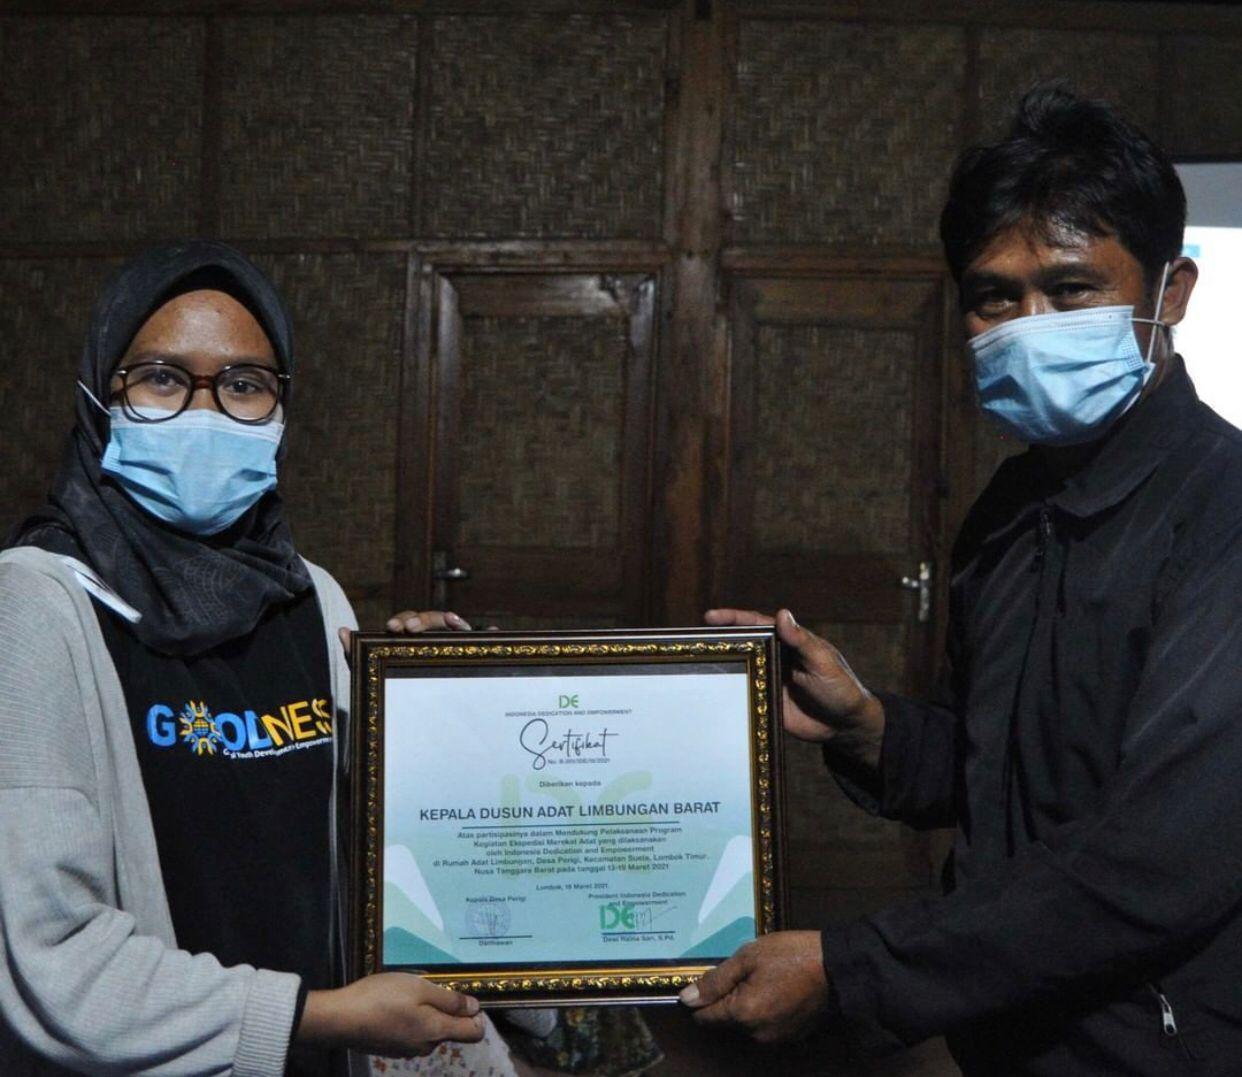 Program Merekat Adat IDE Indonesia